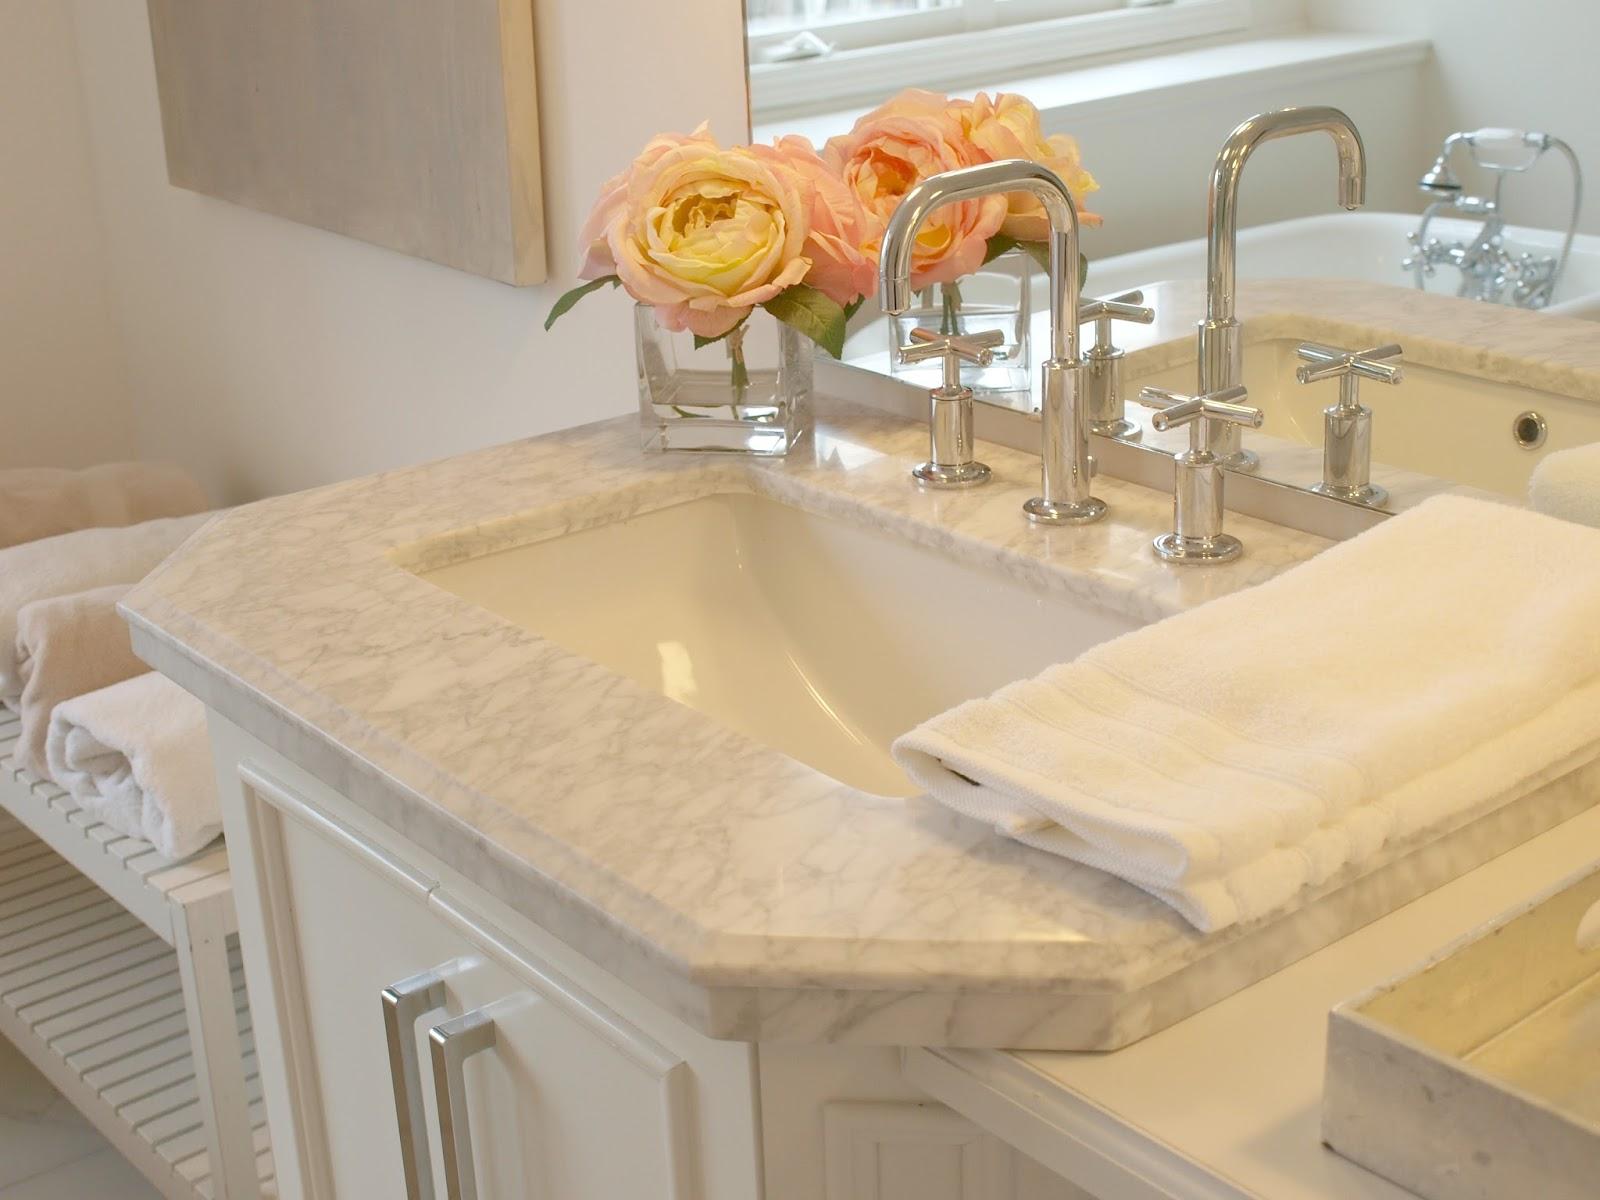 Marble topped vanity in master bathroom - Hello Lovely Studio